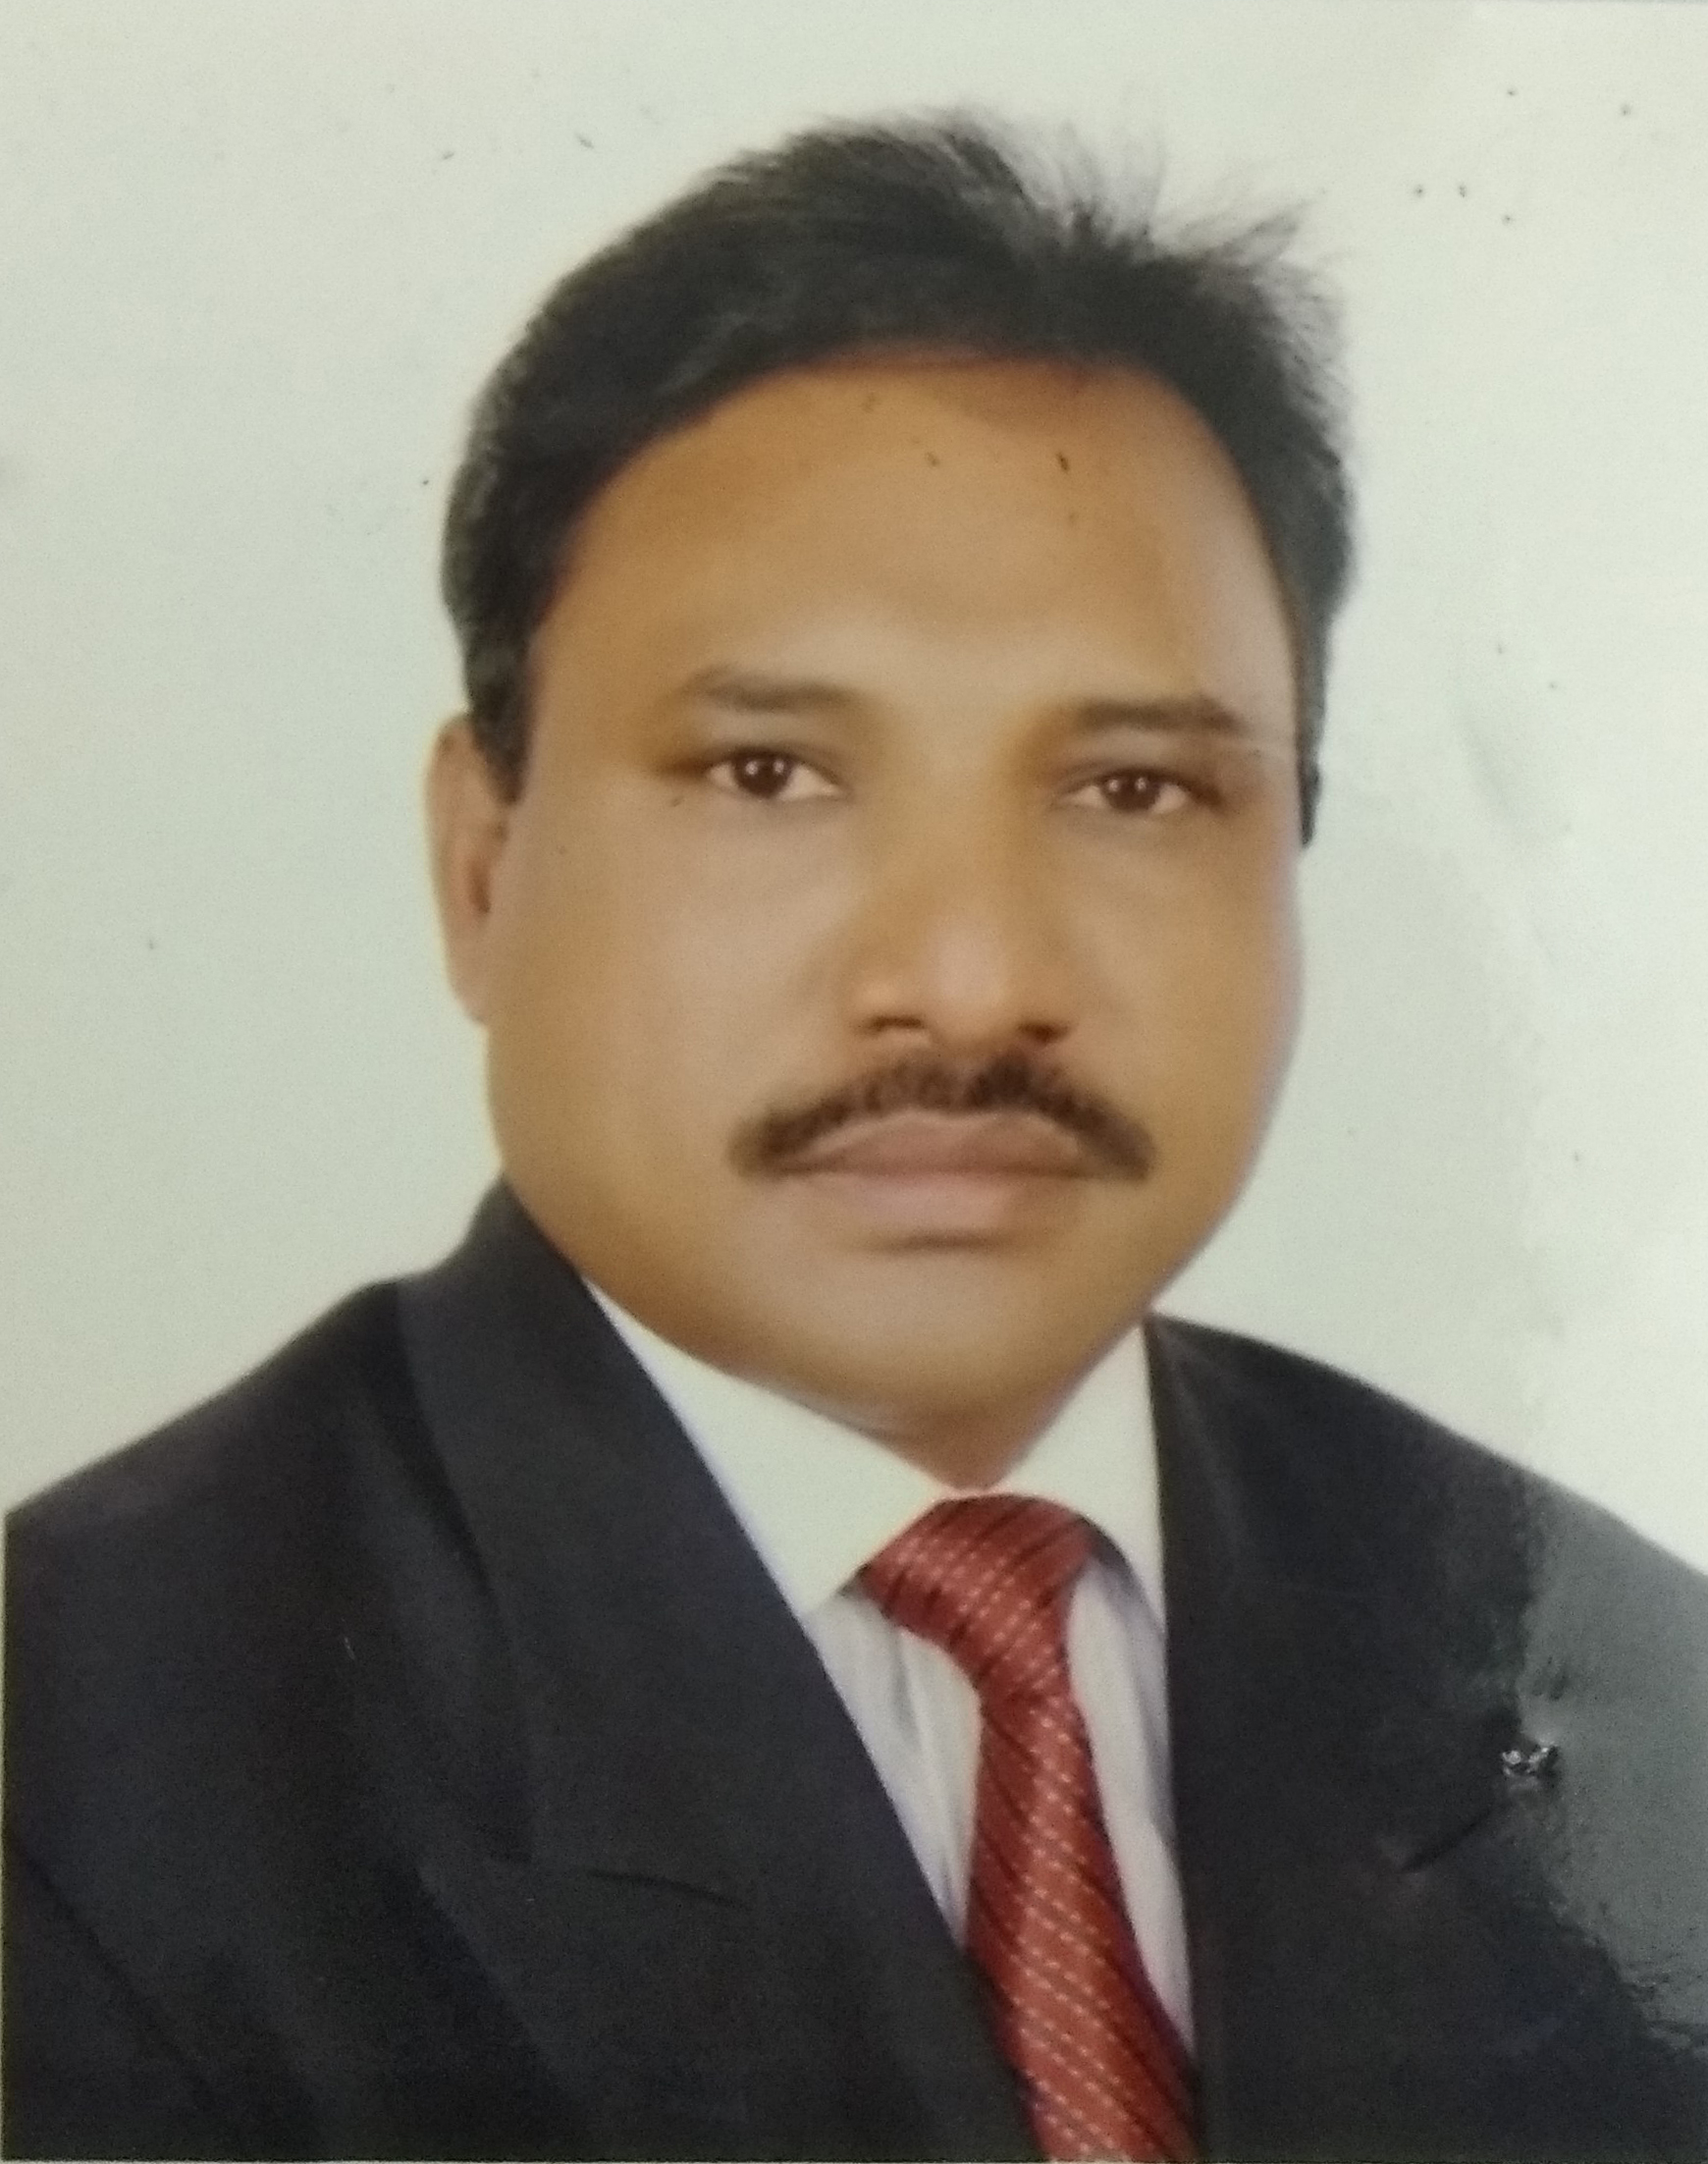 Mr. Md. Azizur Rahman Patwary